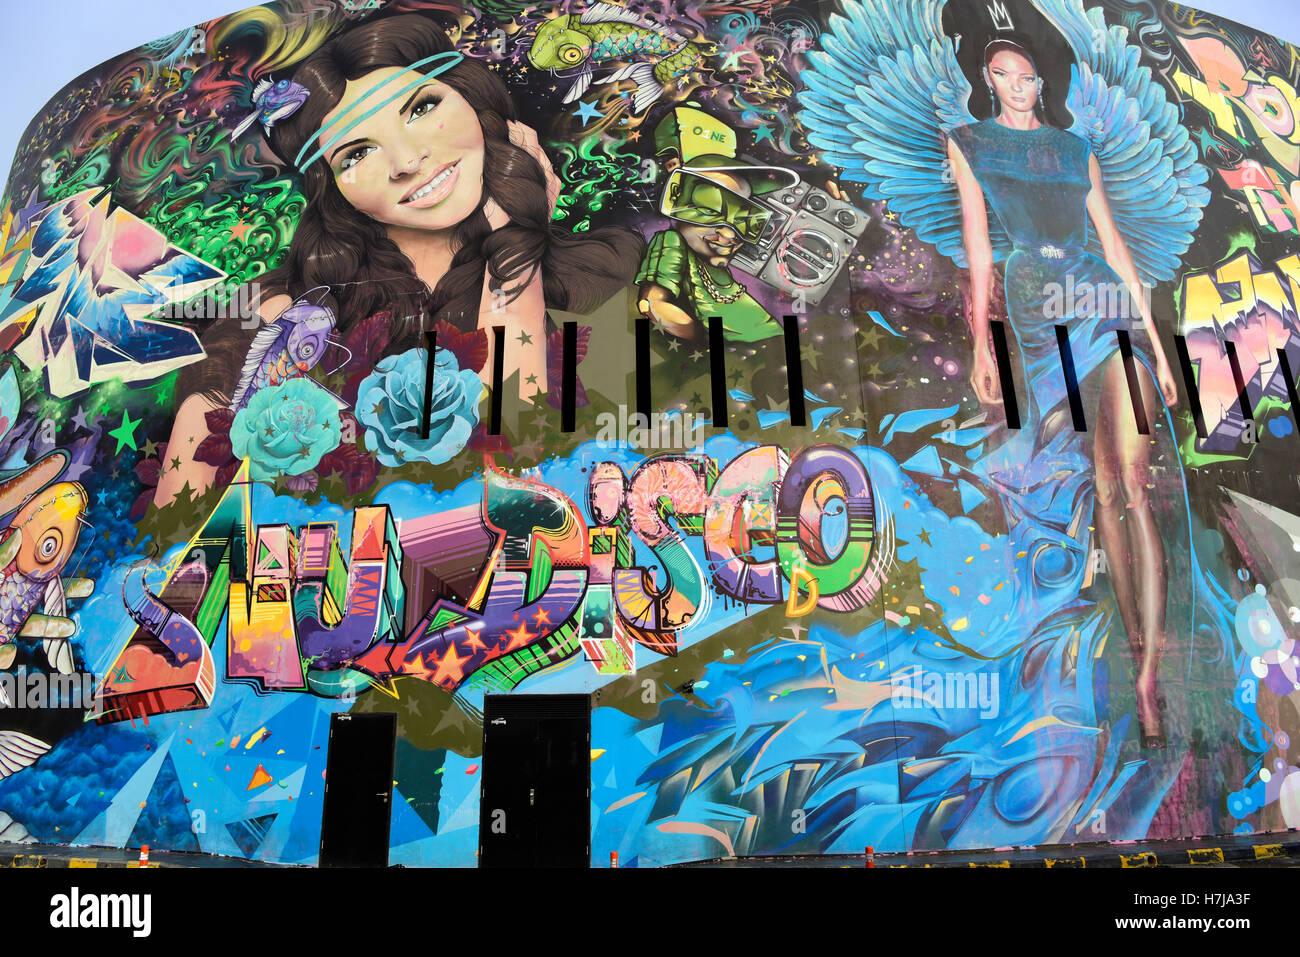 Orné de graffiti O1NW Beyrouth nightclub, Waterfront, Beyrouth, Liban. Photo Stock